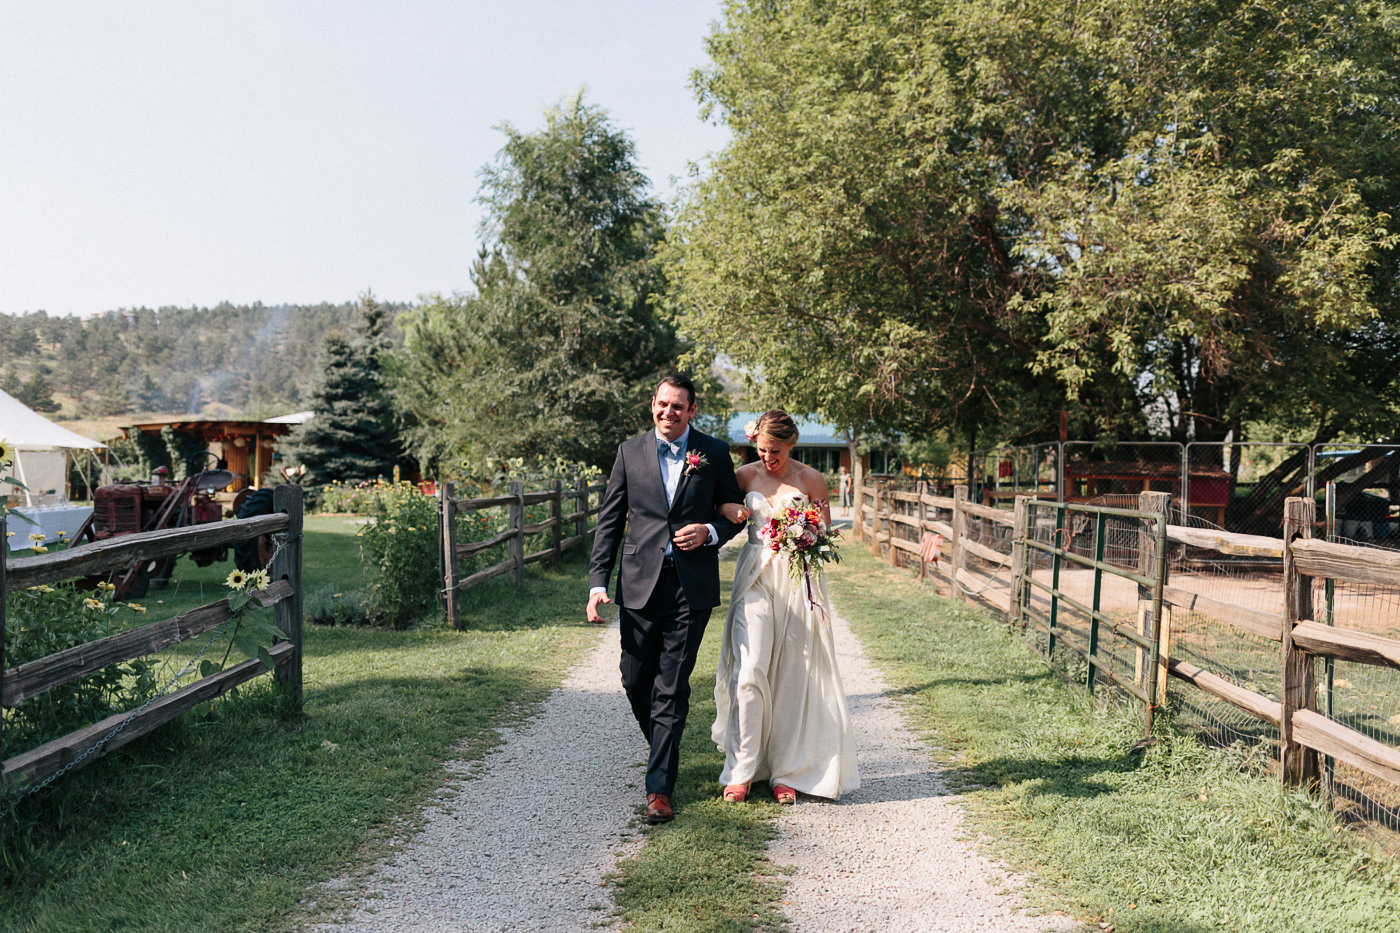 Lyons-Farmette-Wedding-Photographer-Lucy-Austin-Flash-Mob-Dance-15.jpg